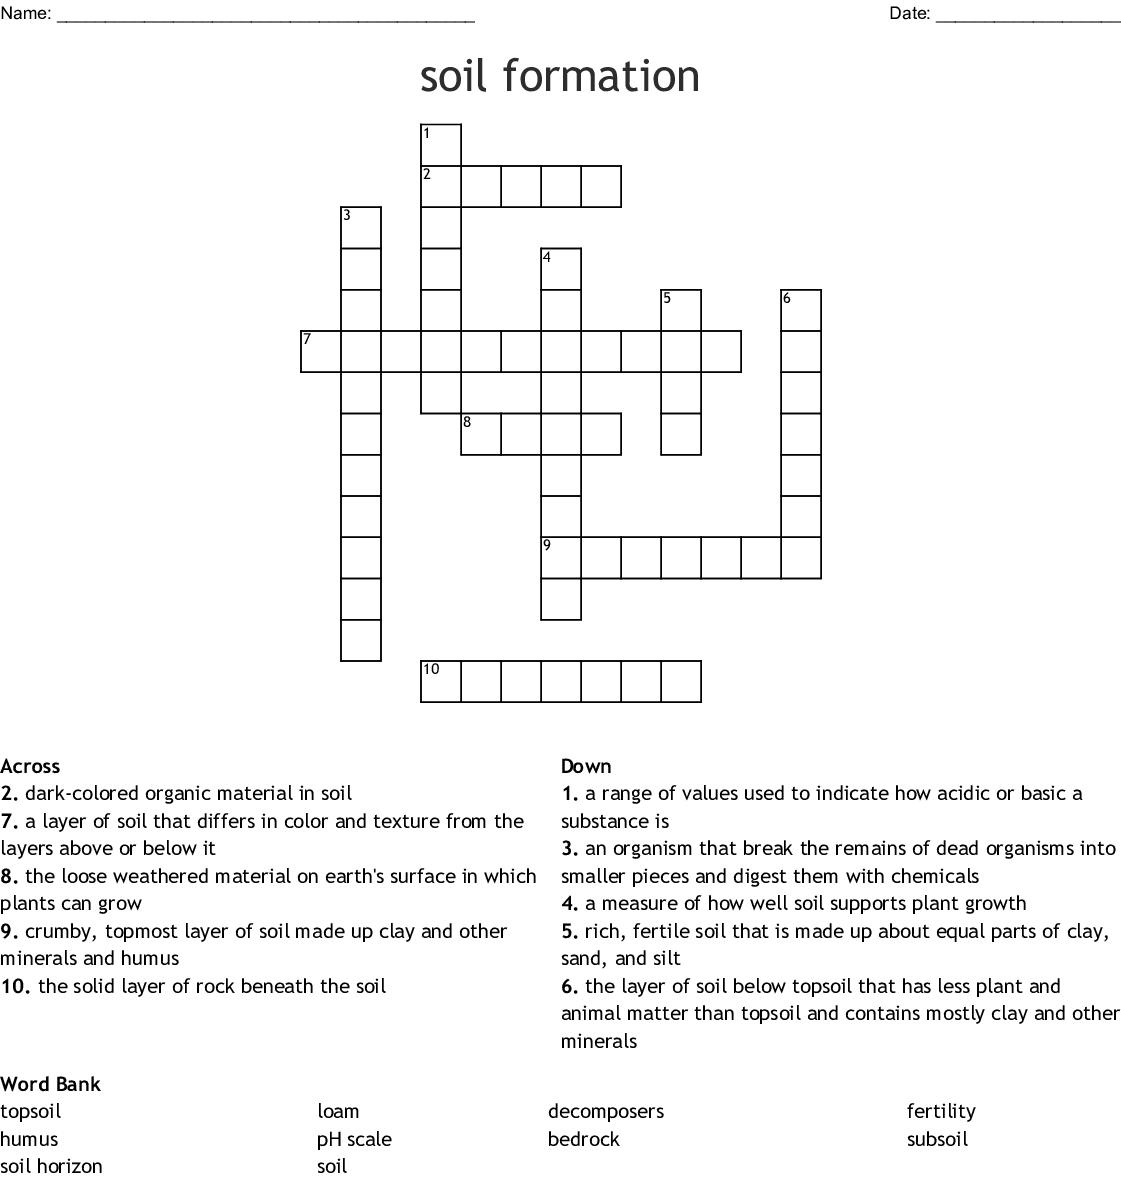 Soil Formation Crossword